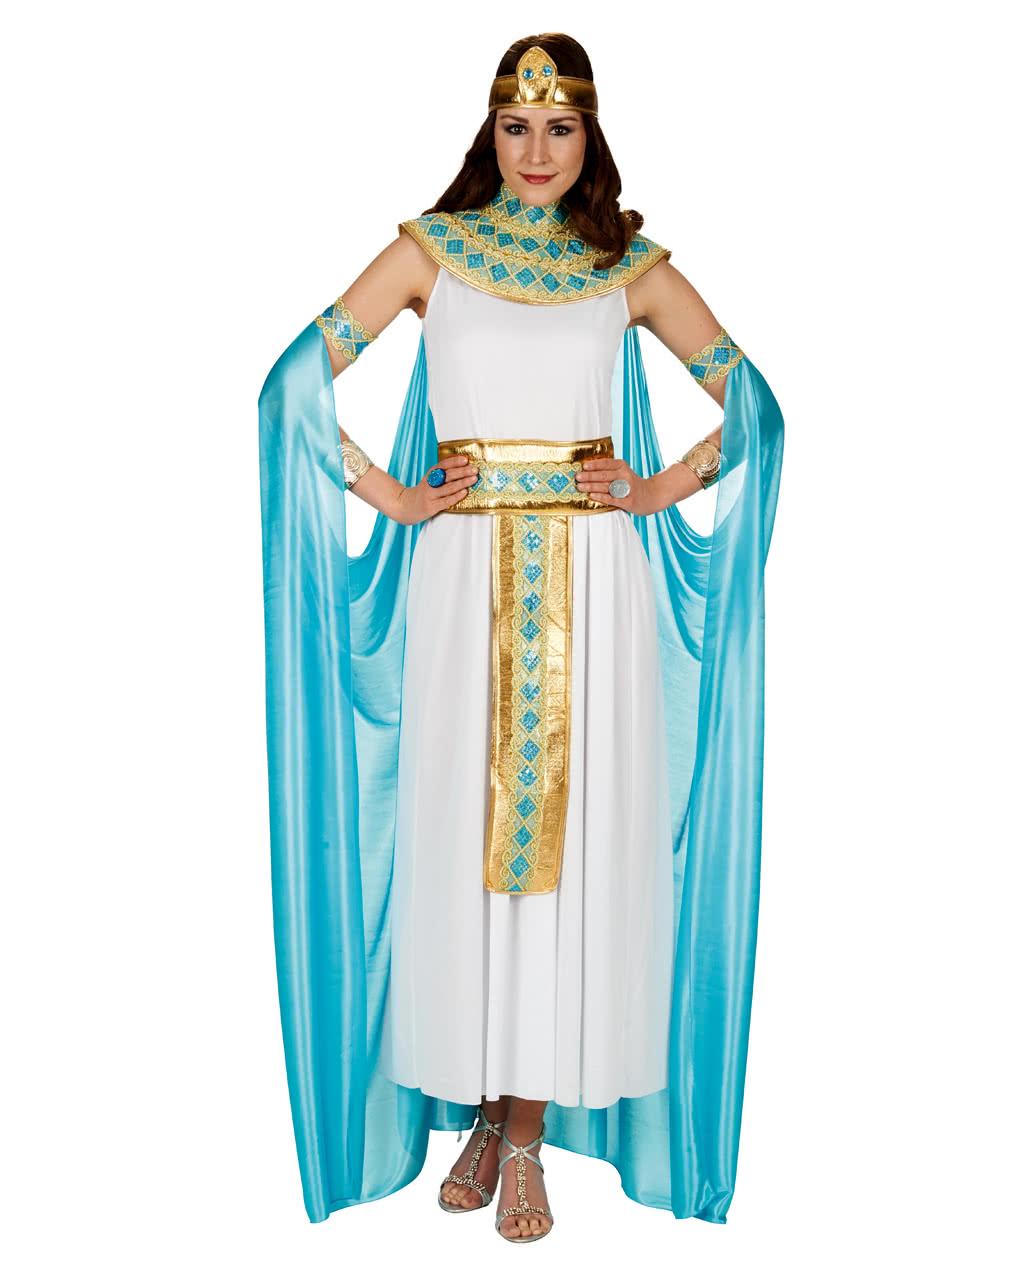 damenkost m cleopatra mit cape als faschingskost m. Black Bedroom Furniture Sets. Home Design Ideas